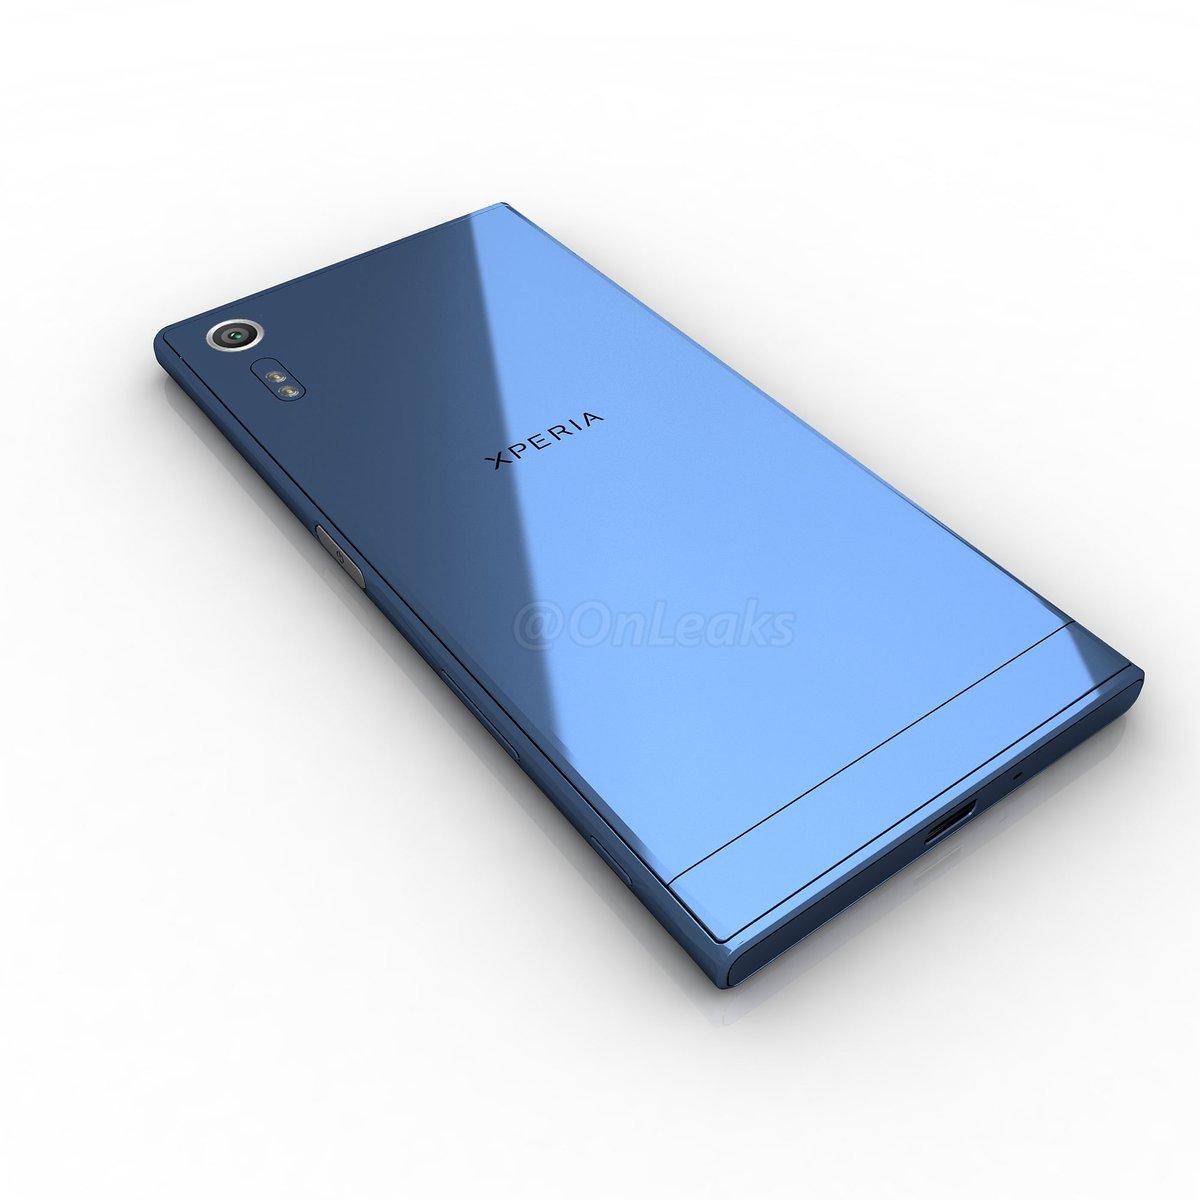 České Sony neuhlídalo informace – Xperia XZ a Xperia X Compact [aktualizováno]